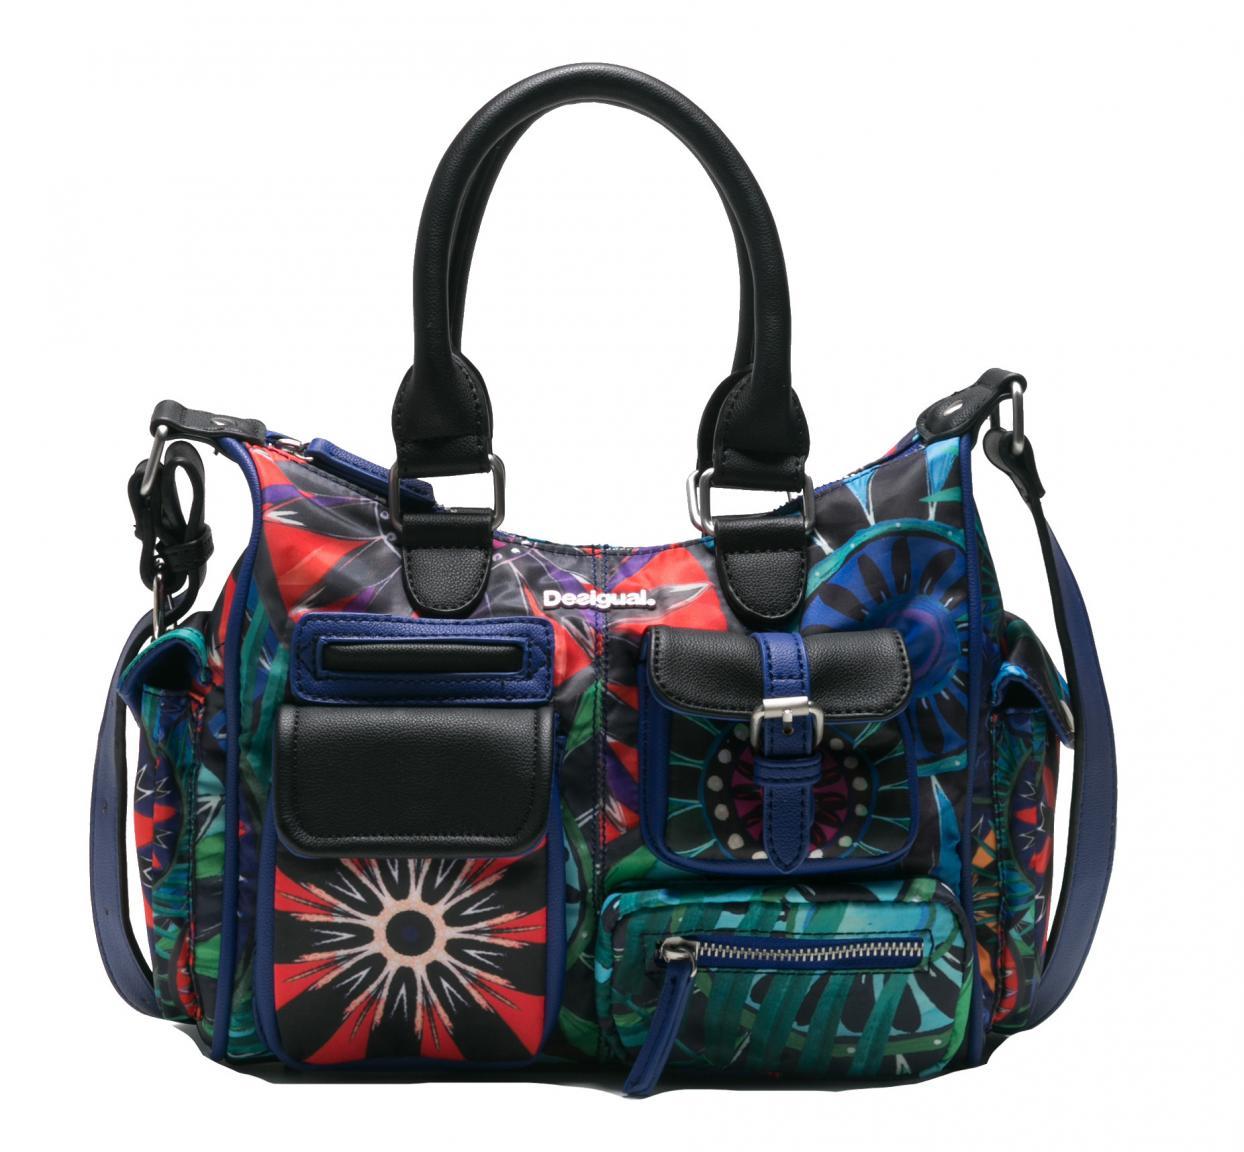 f507a1187690f4 Desigual London Indian Bols More Mini Galactic Bagsamp  Handtasche kuZXOiP